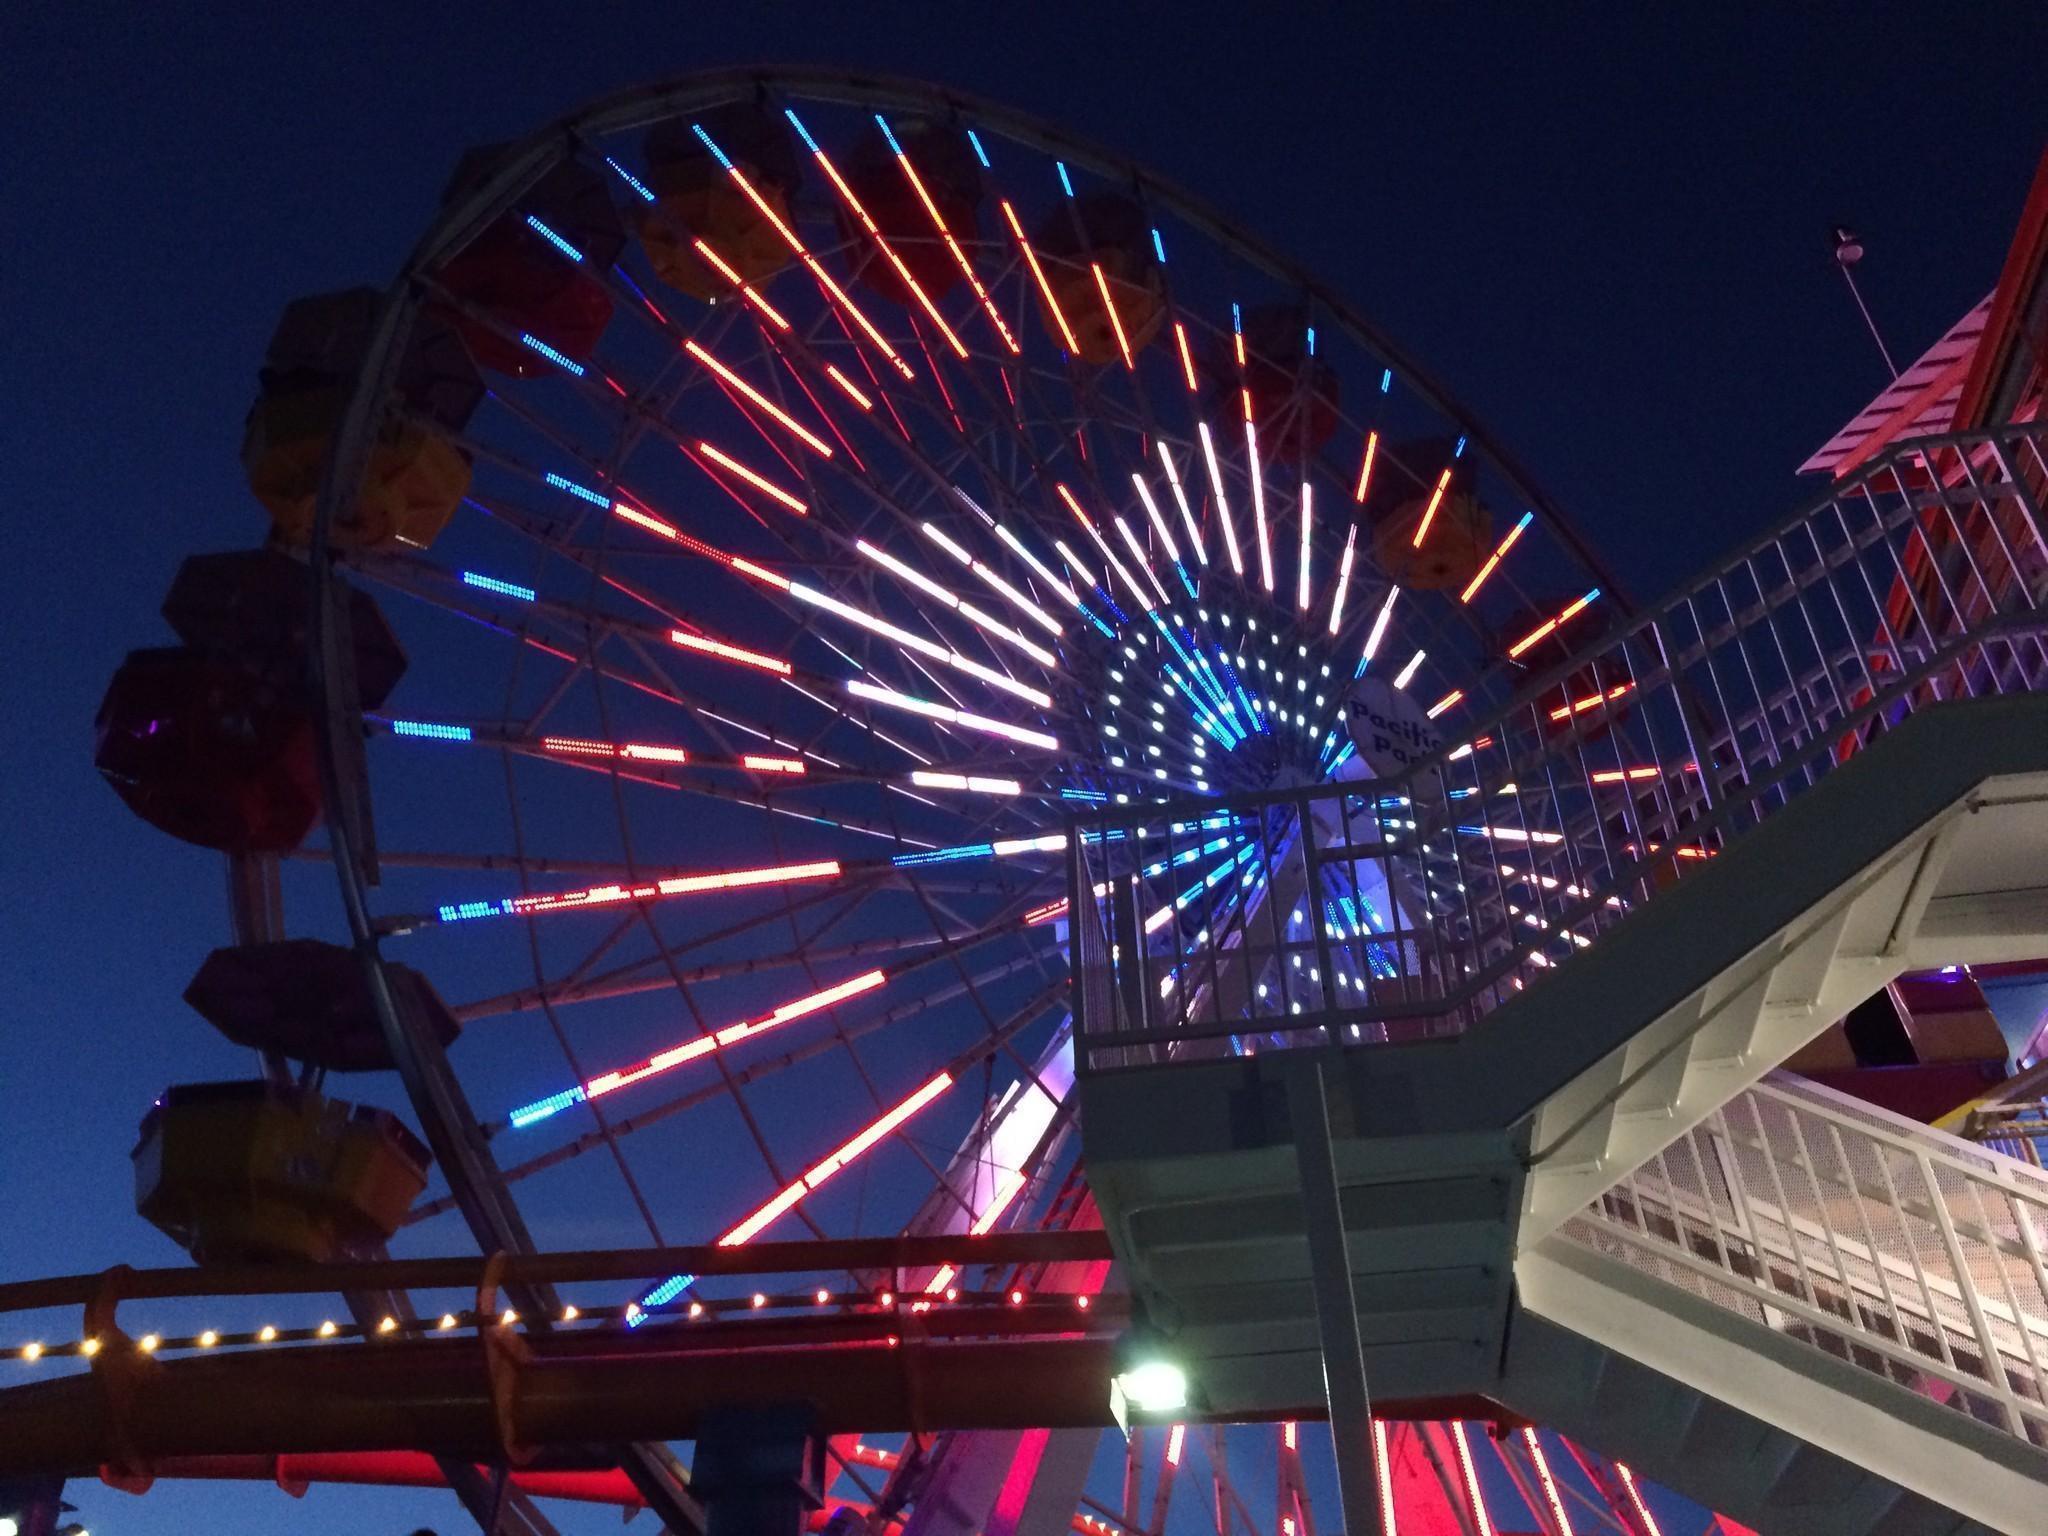 The Ferris wheel at the Santa Monica Pier. (Carolina A. Miranda / Los Angeles Times)